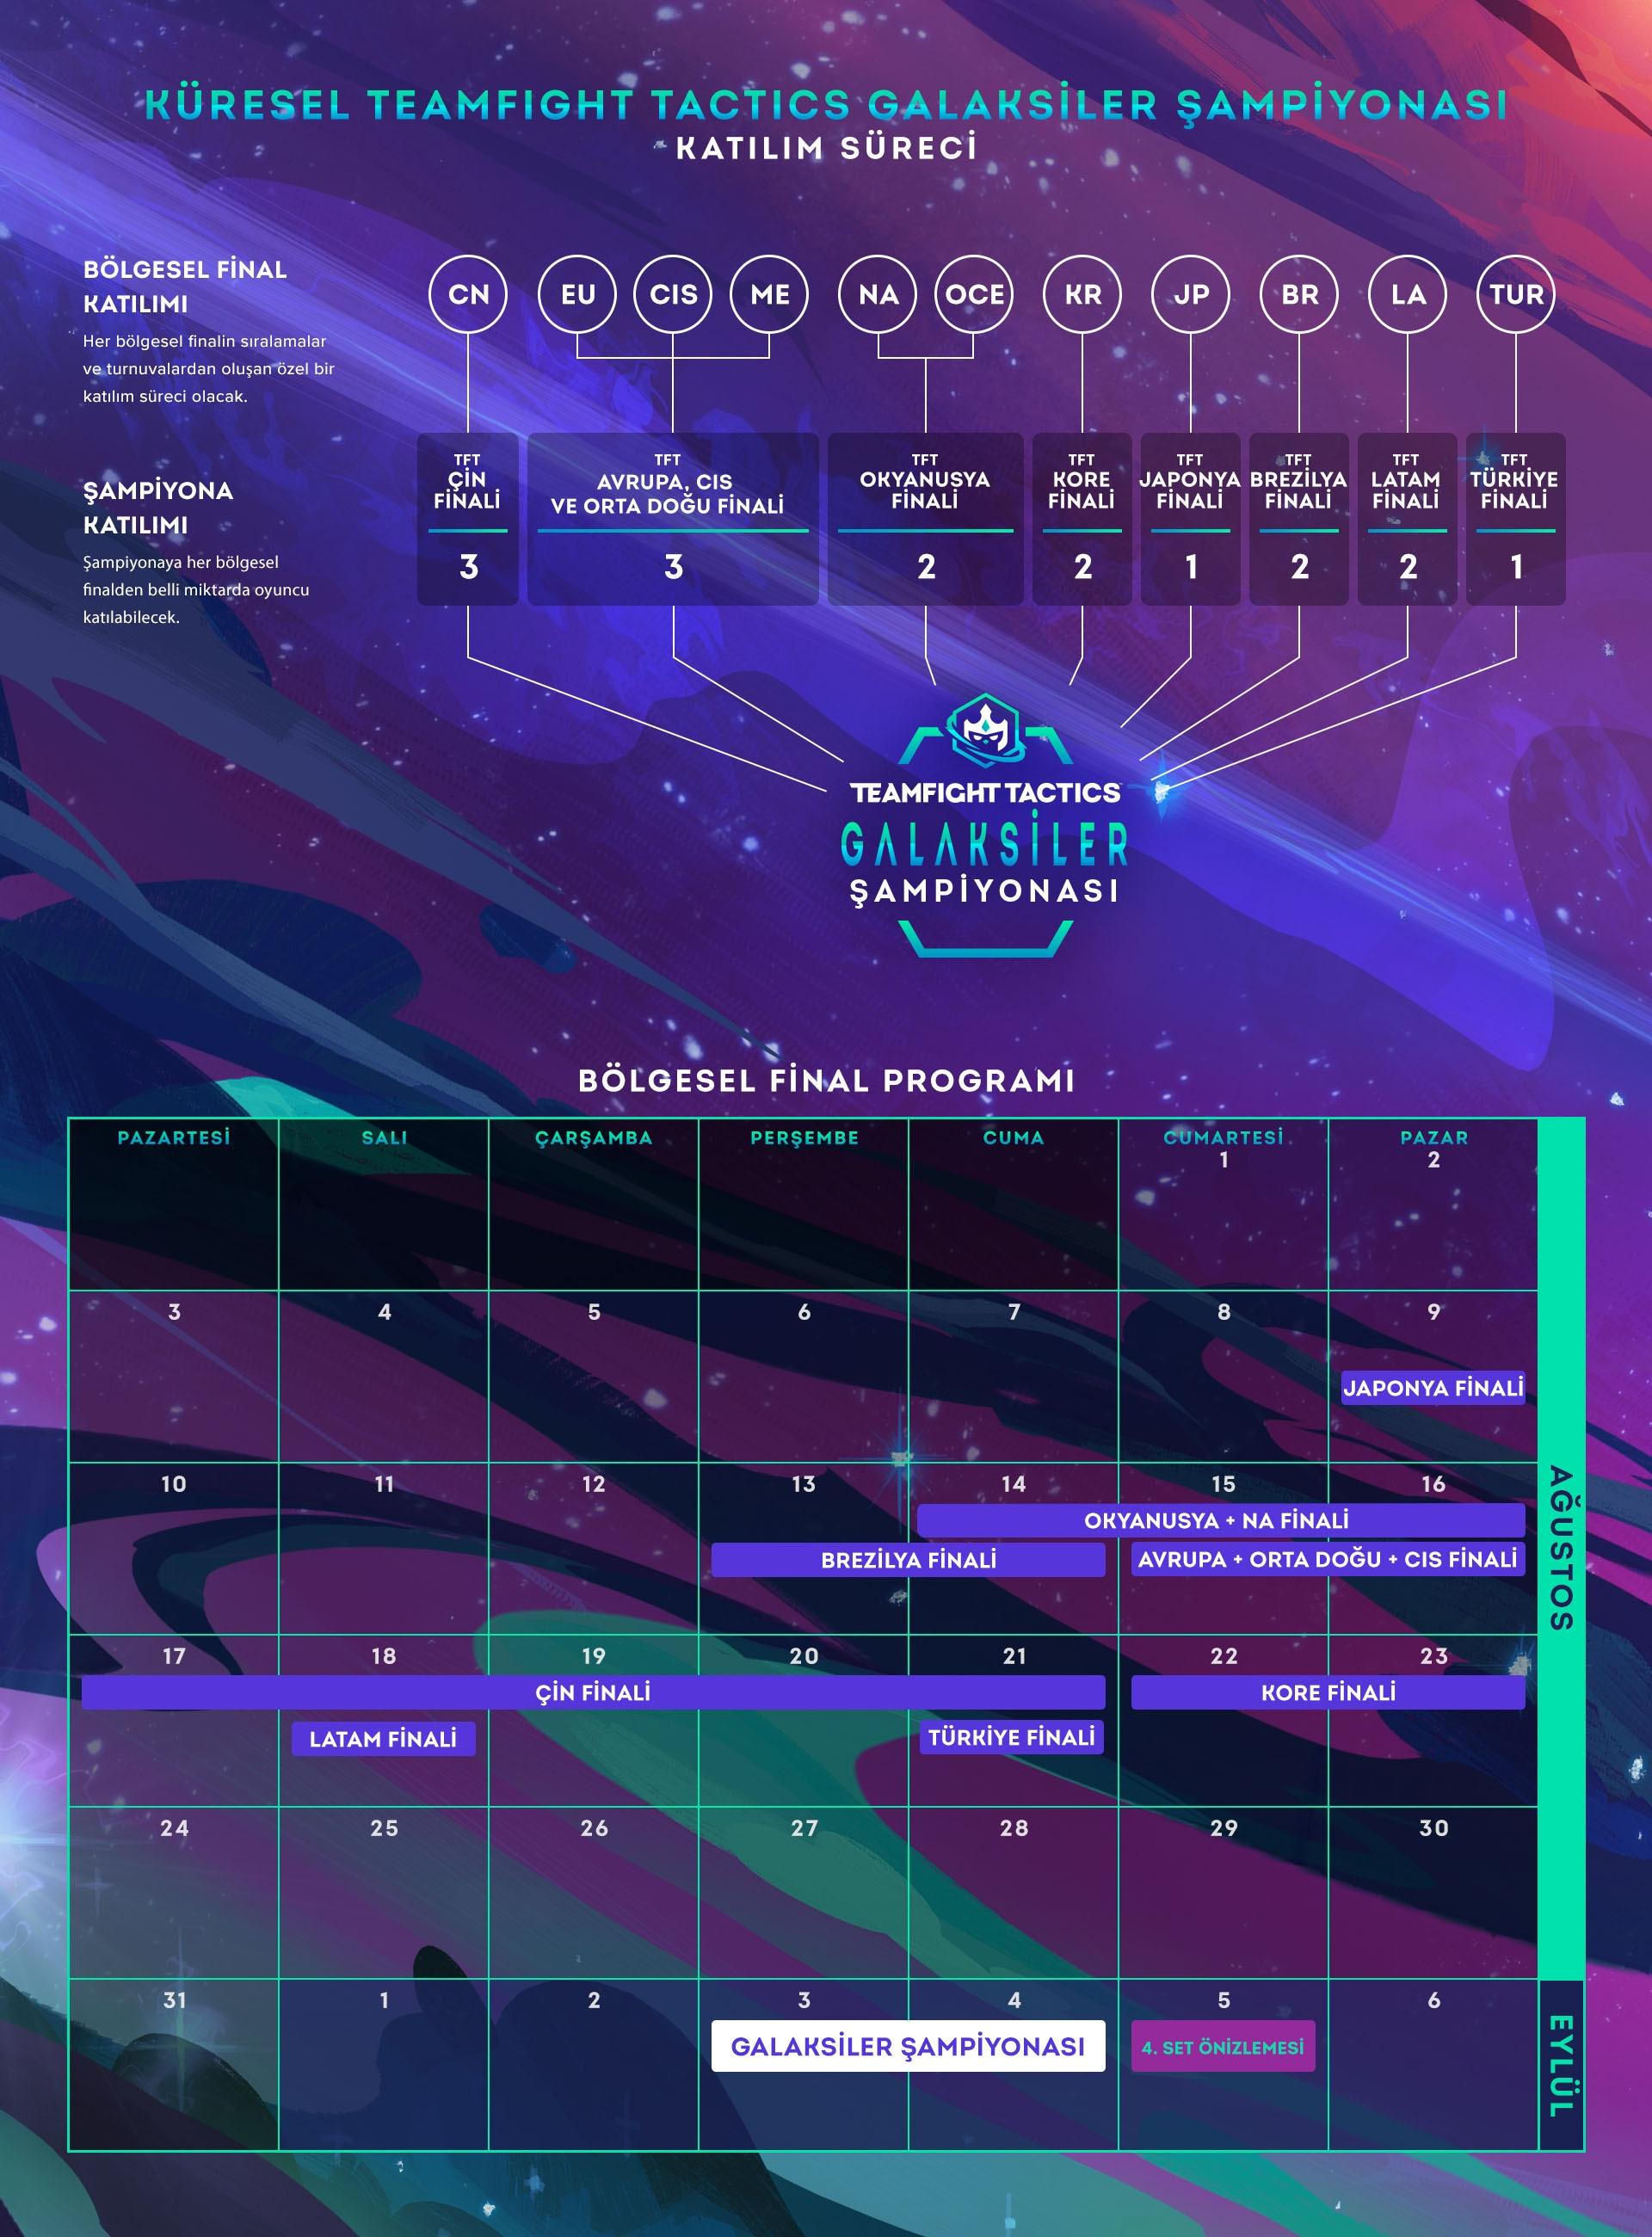 Copy_of_tft-championship-graphic-v1.3_TR.jpg